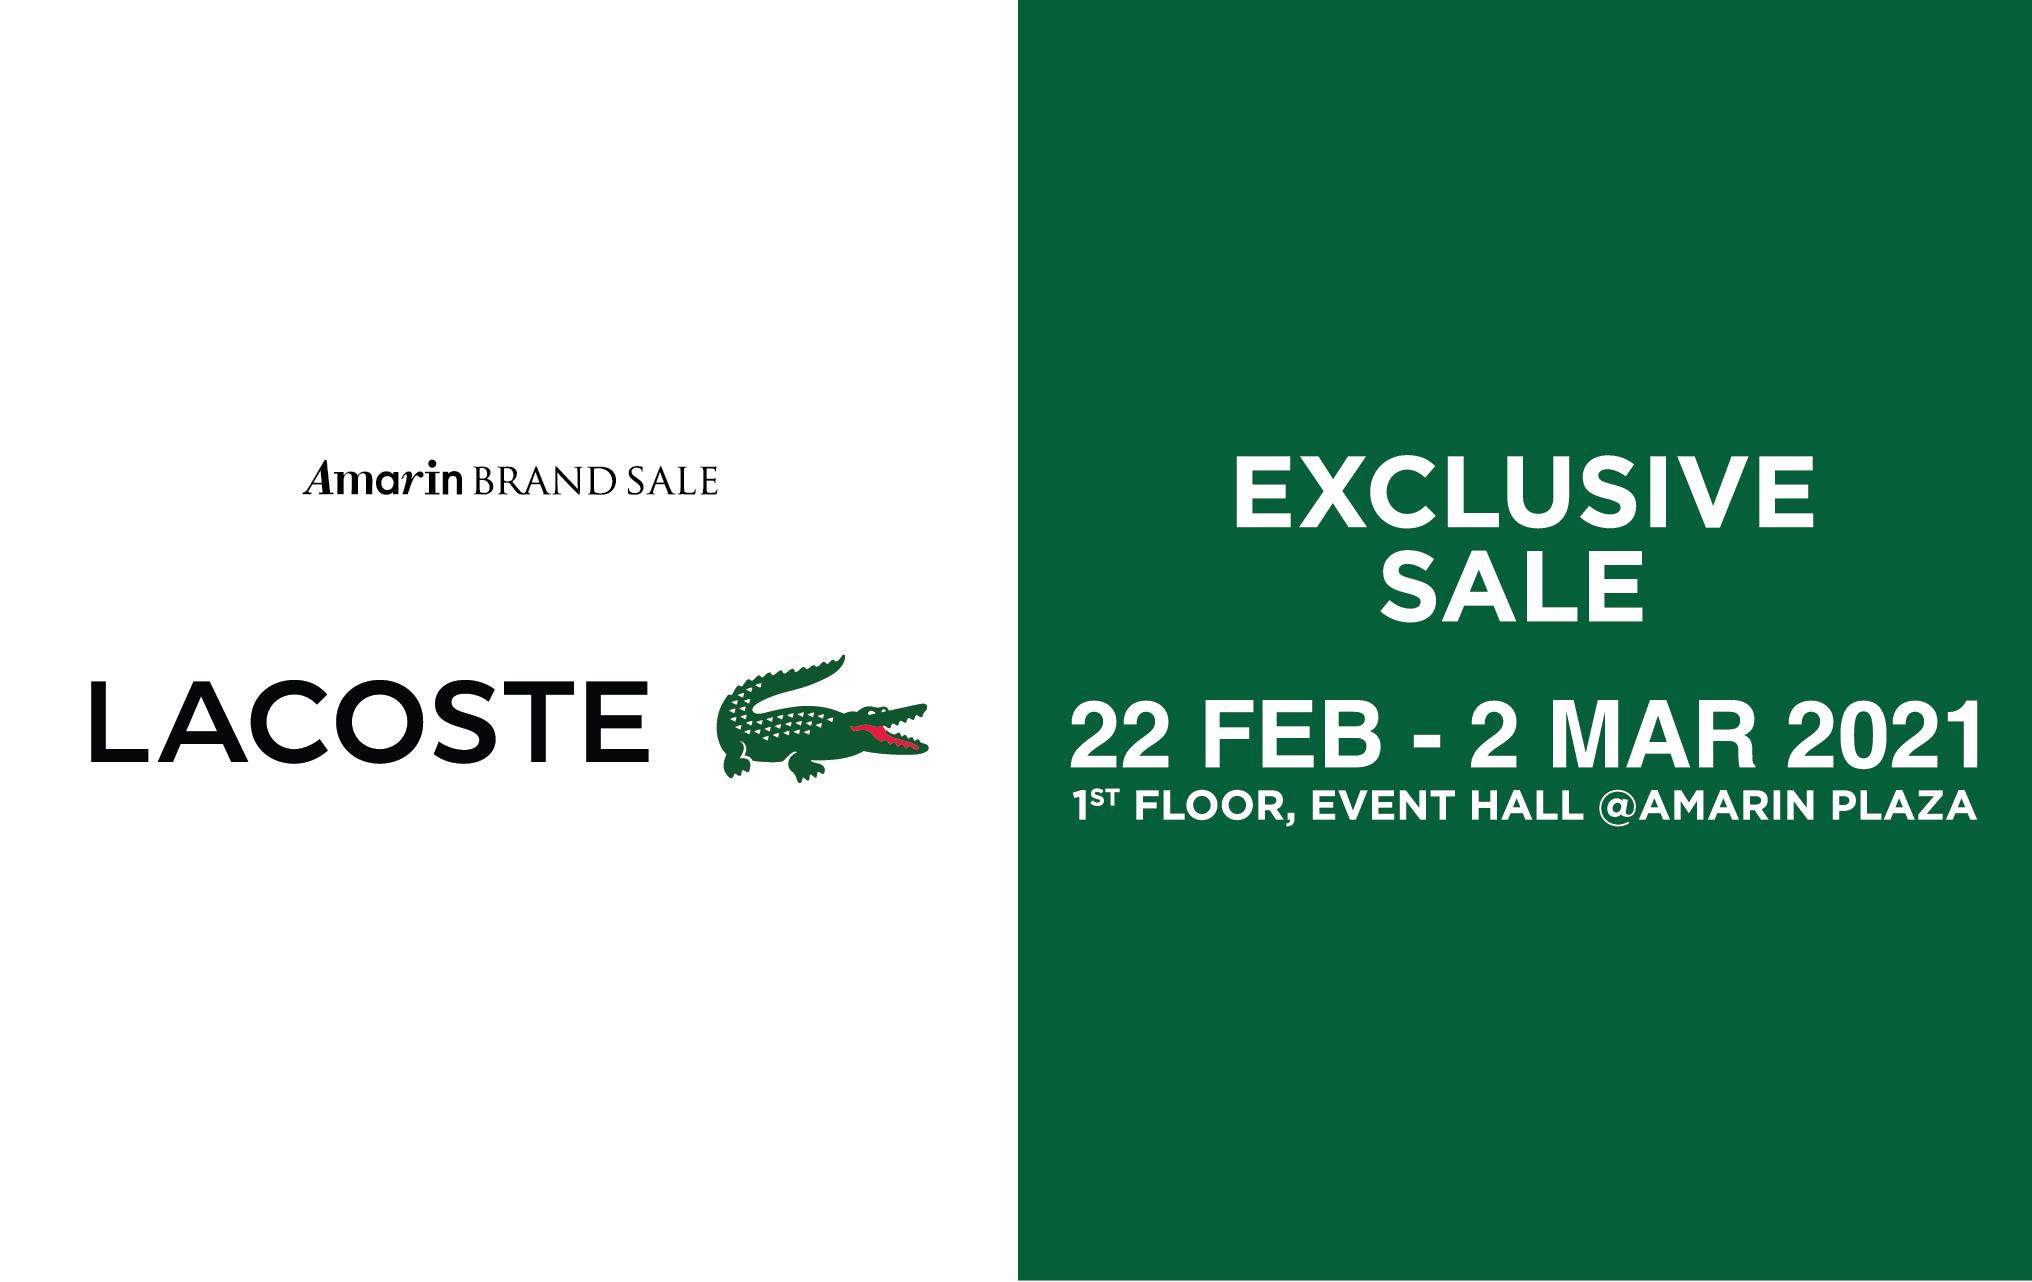 #LACOSTE Exclusive Sale ลดสูงสุด 70%